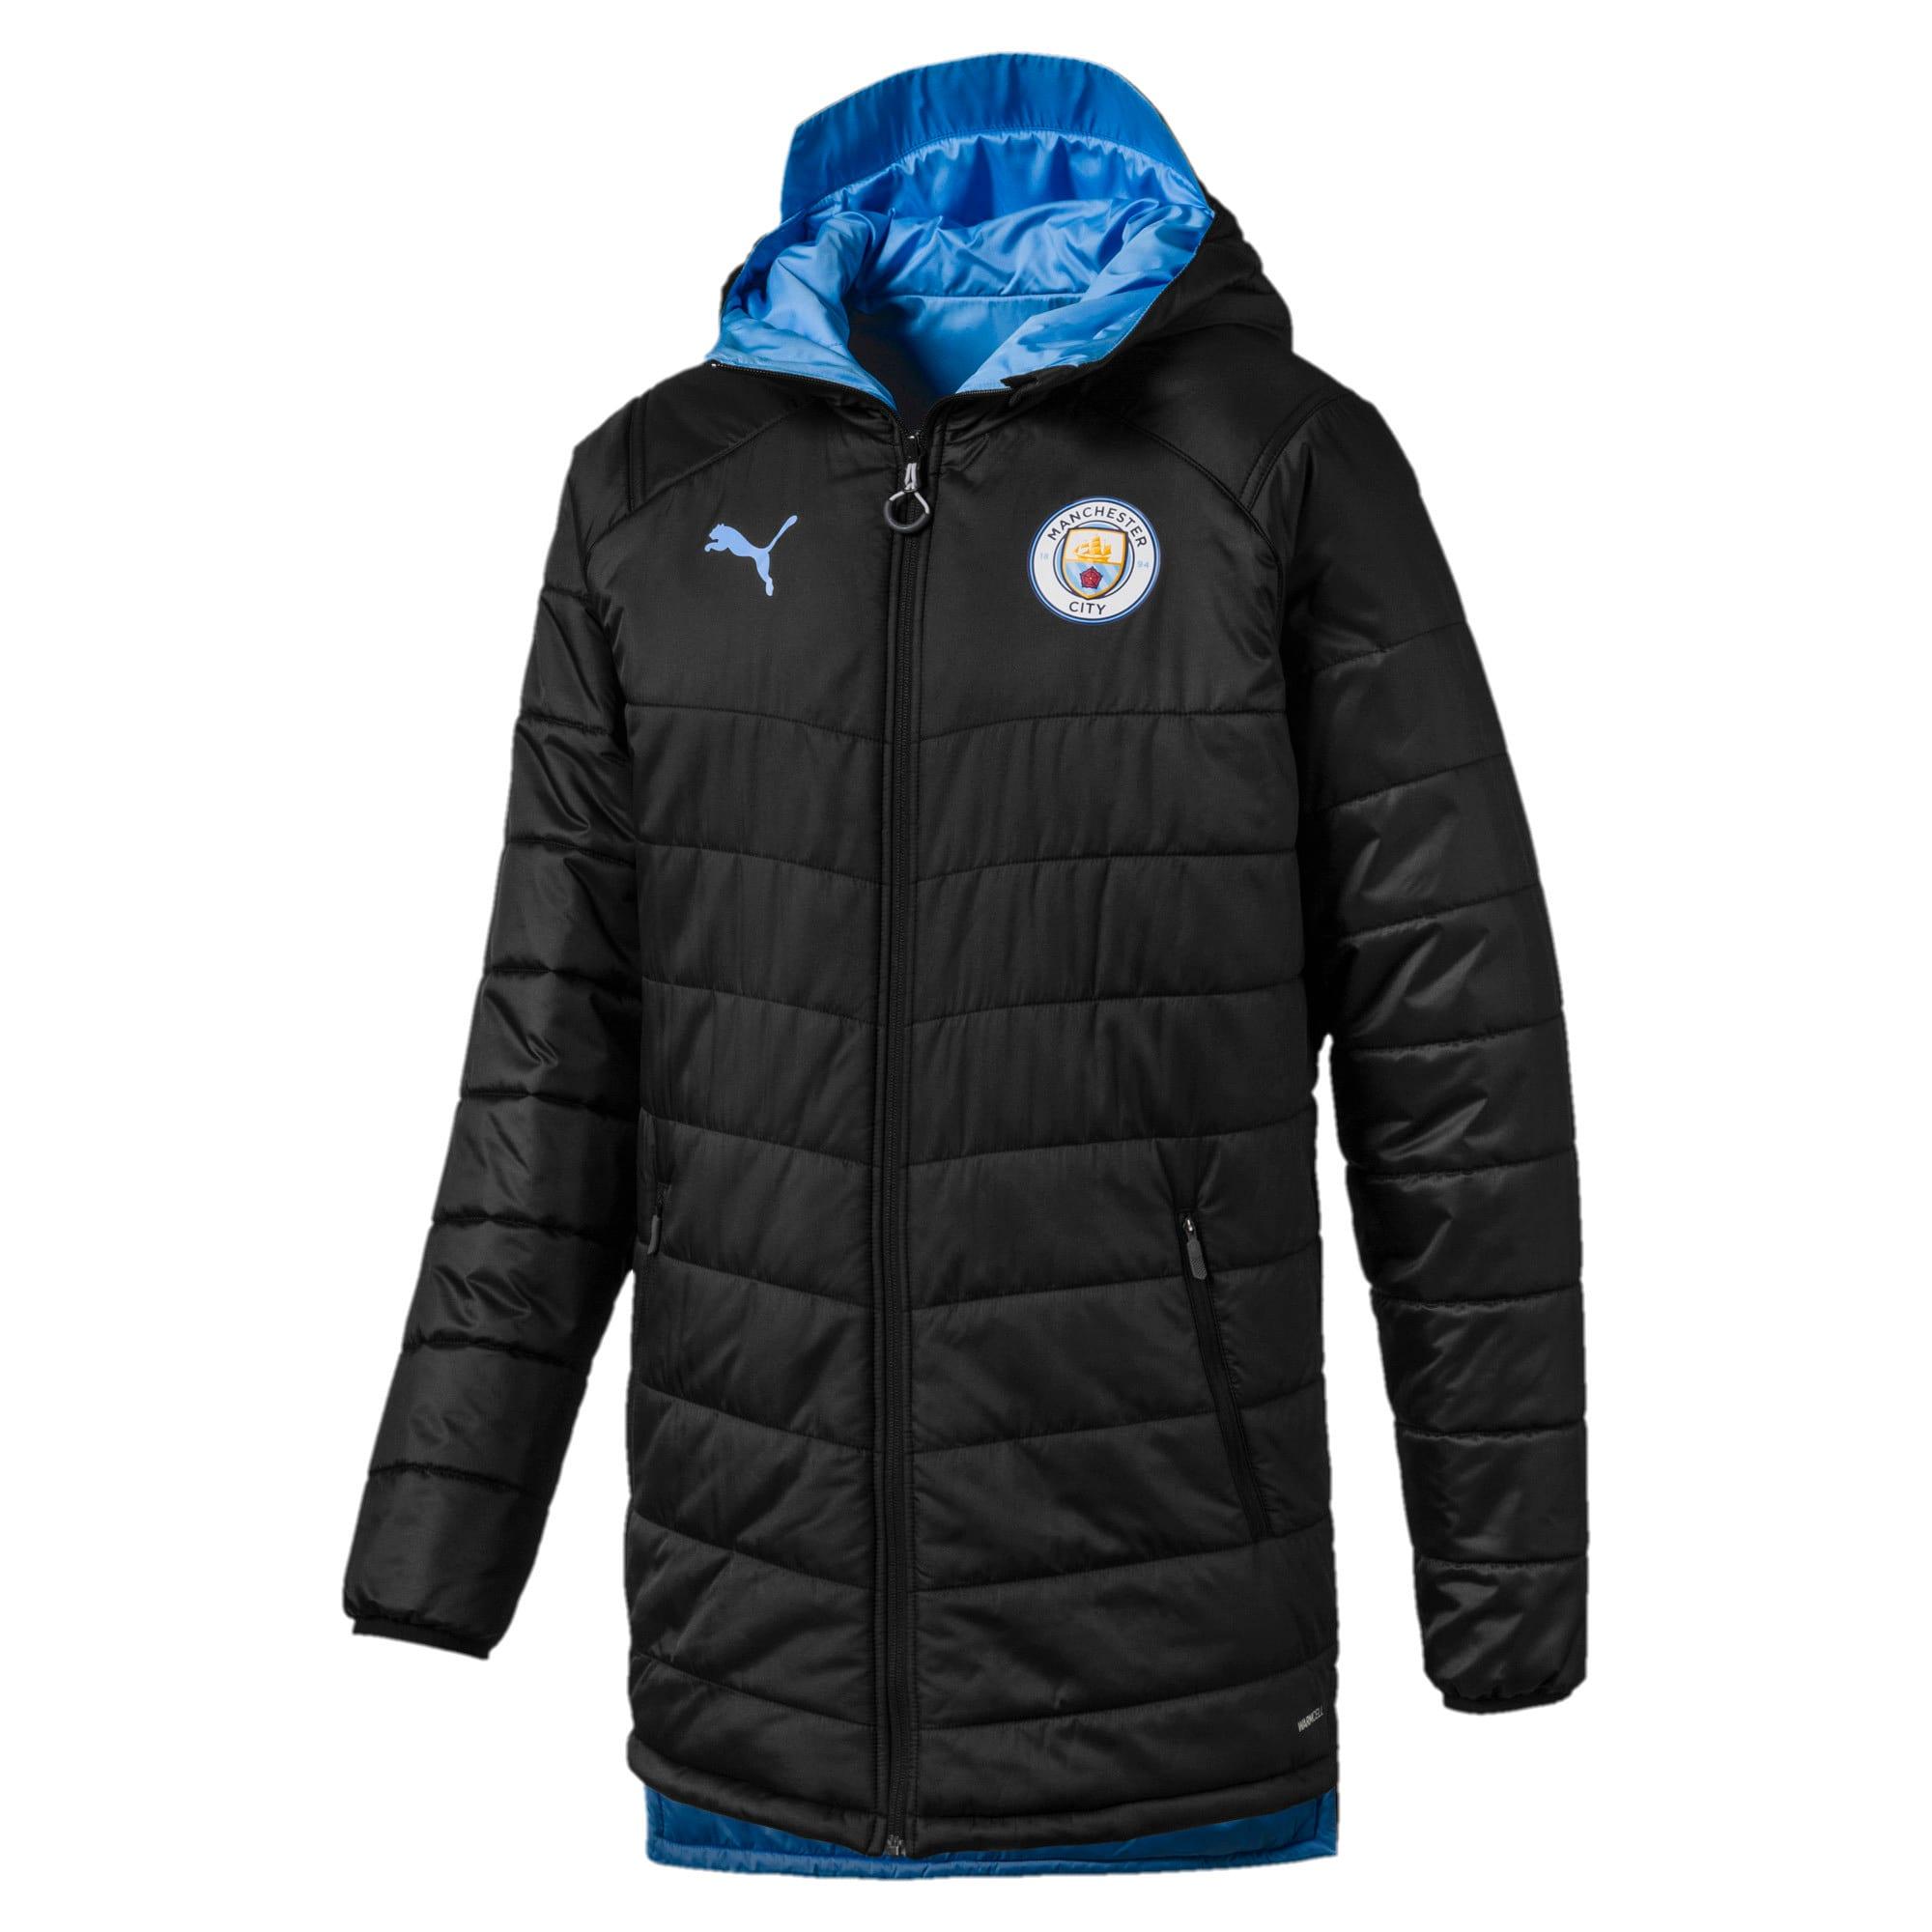 Thumbnail 1 of Manchester City Bench Herren Replica Wendejacke, Puma Black-Team Light Blue, medium